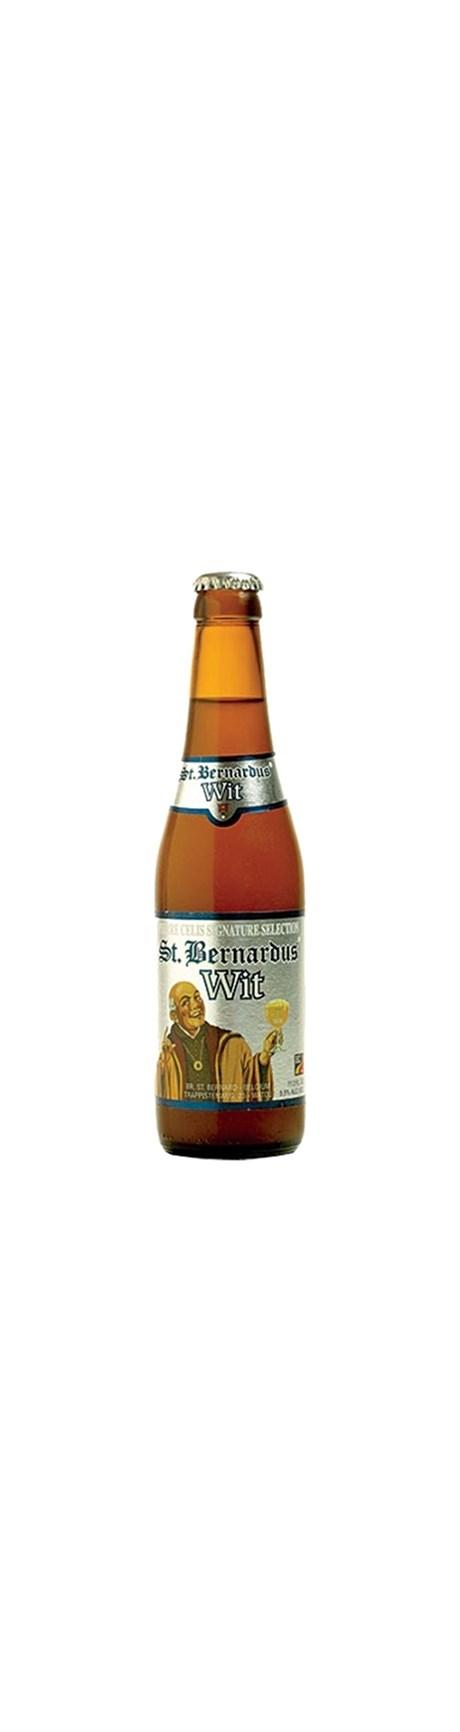 St. Bernardus Wit 330ml